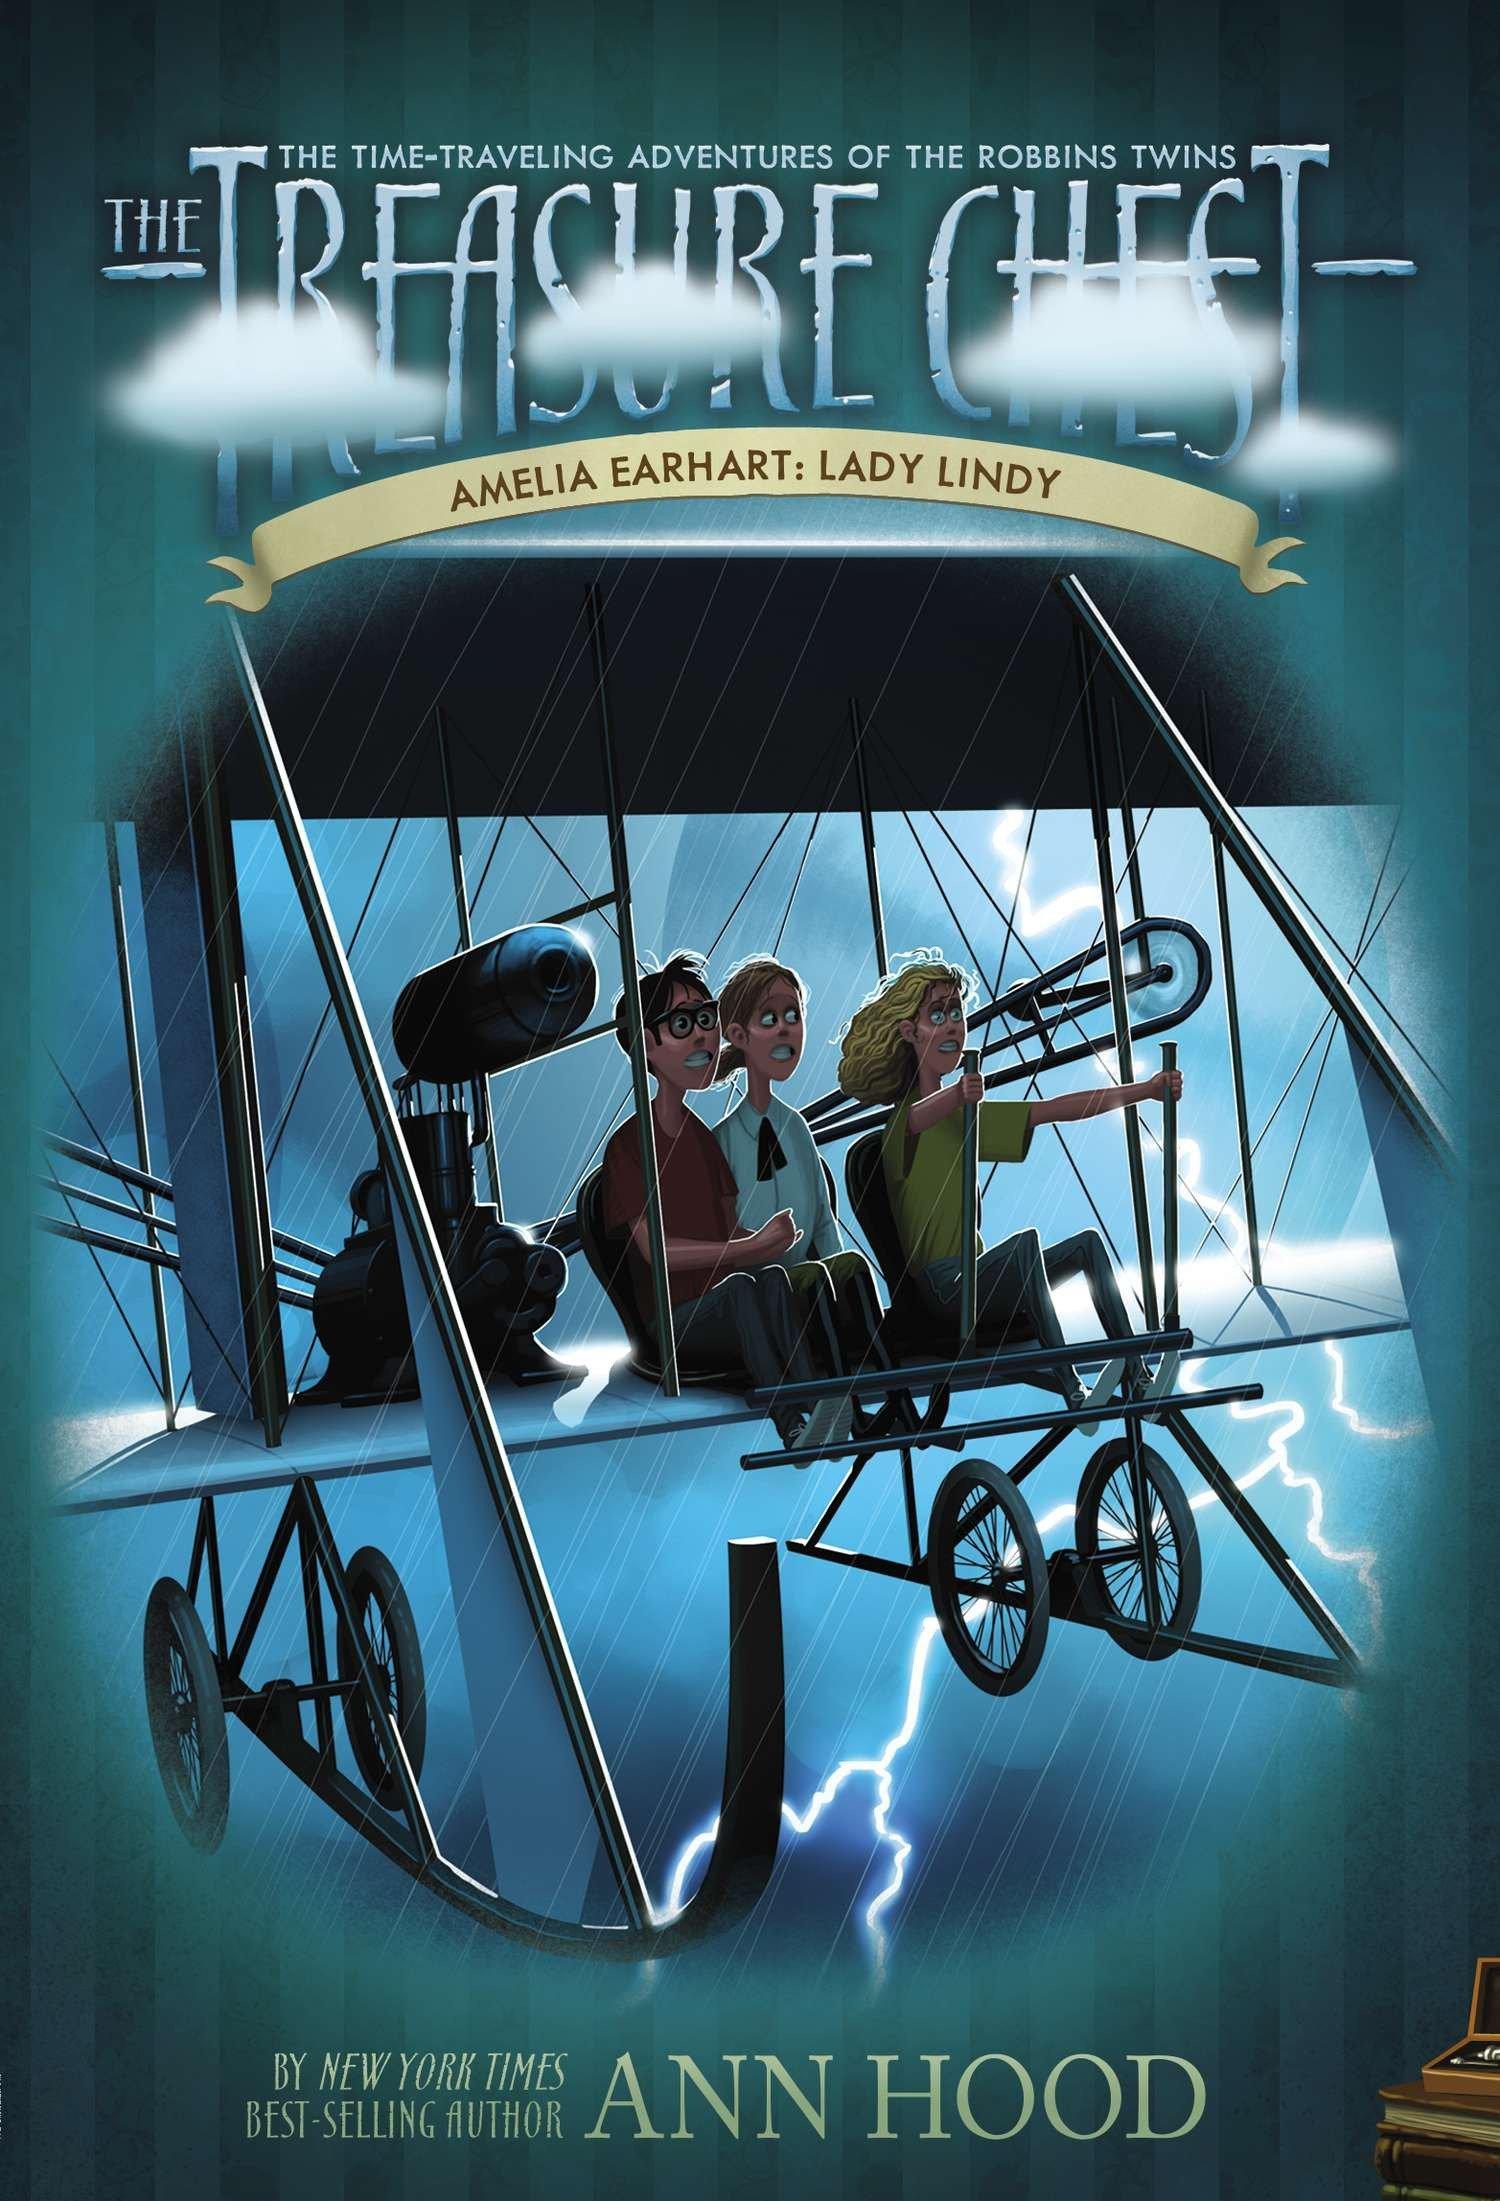 Amelia Earhart #8: Lady Lindy (The Treasure Chest) ebook